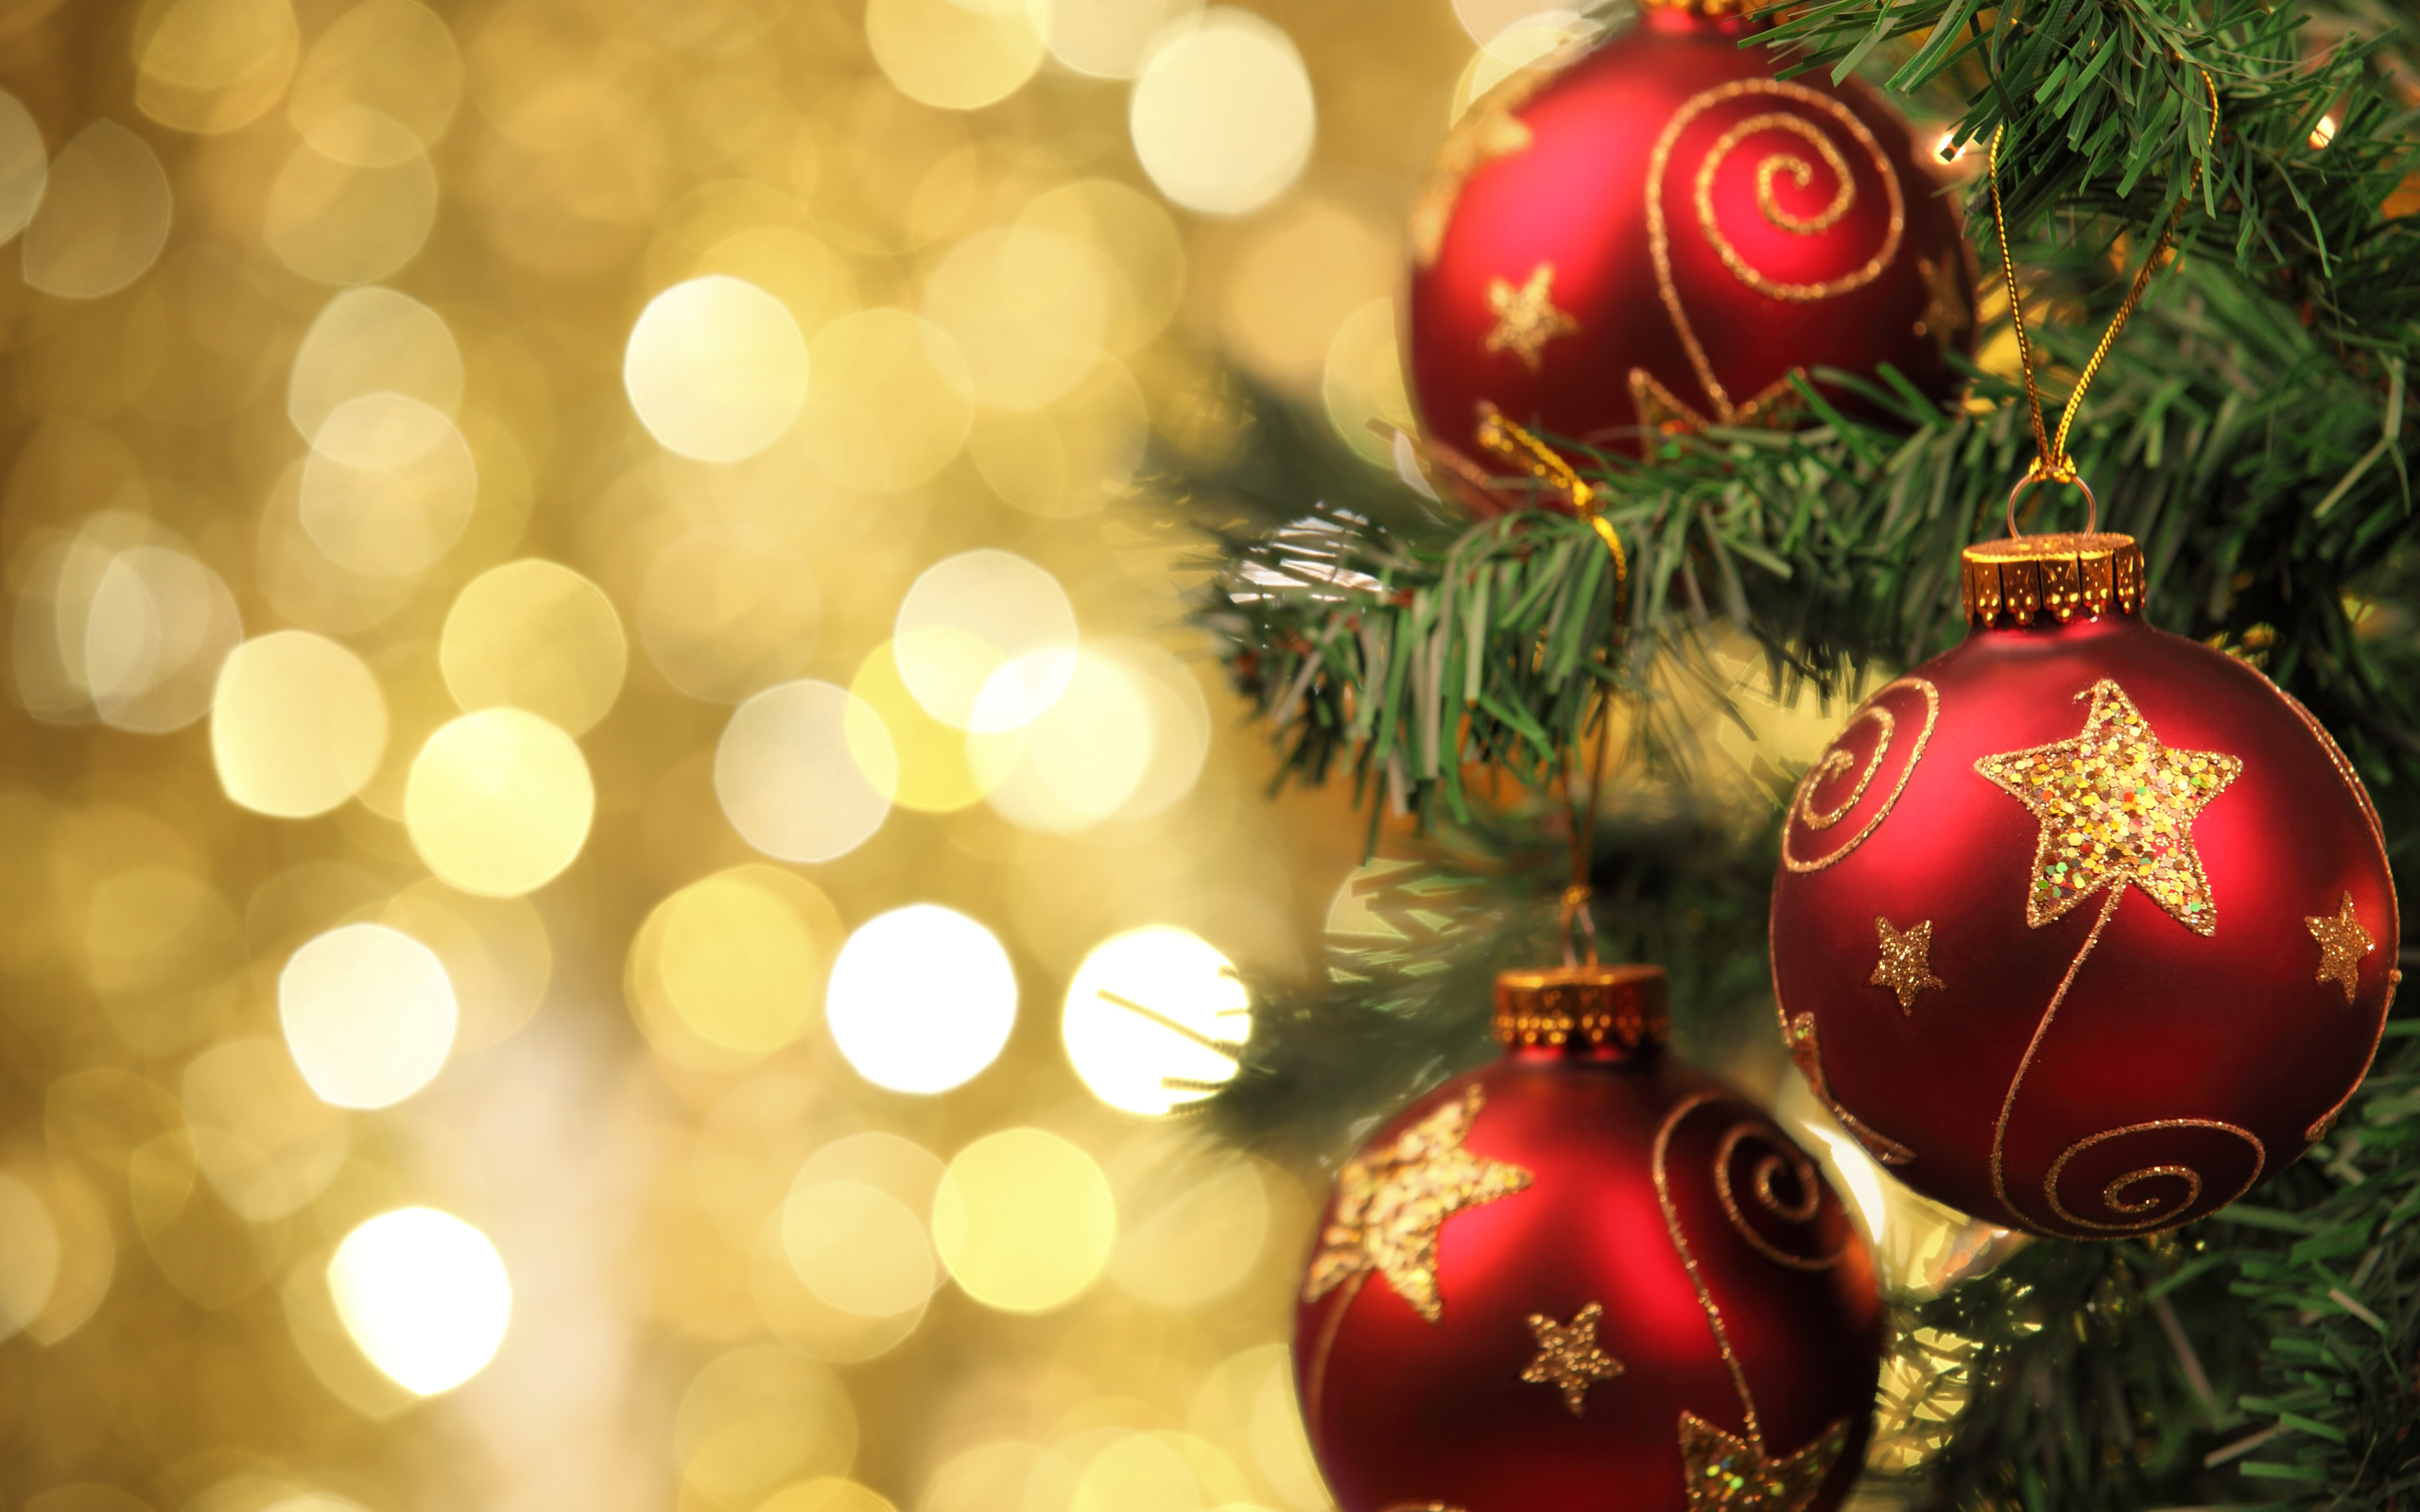 Christmas Ornaments Desktop Background - HD Wallpaper